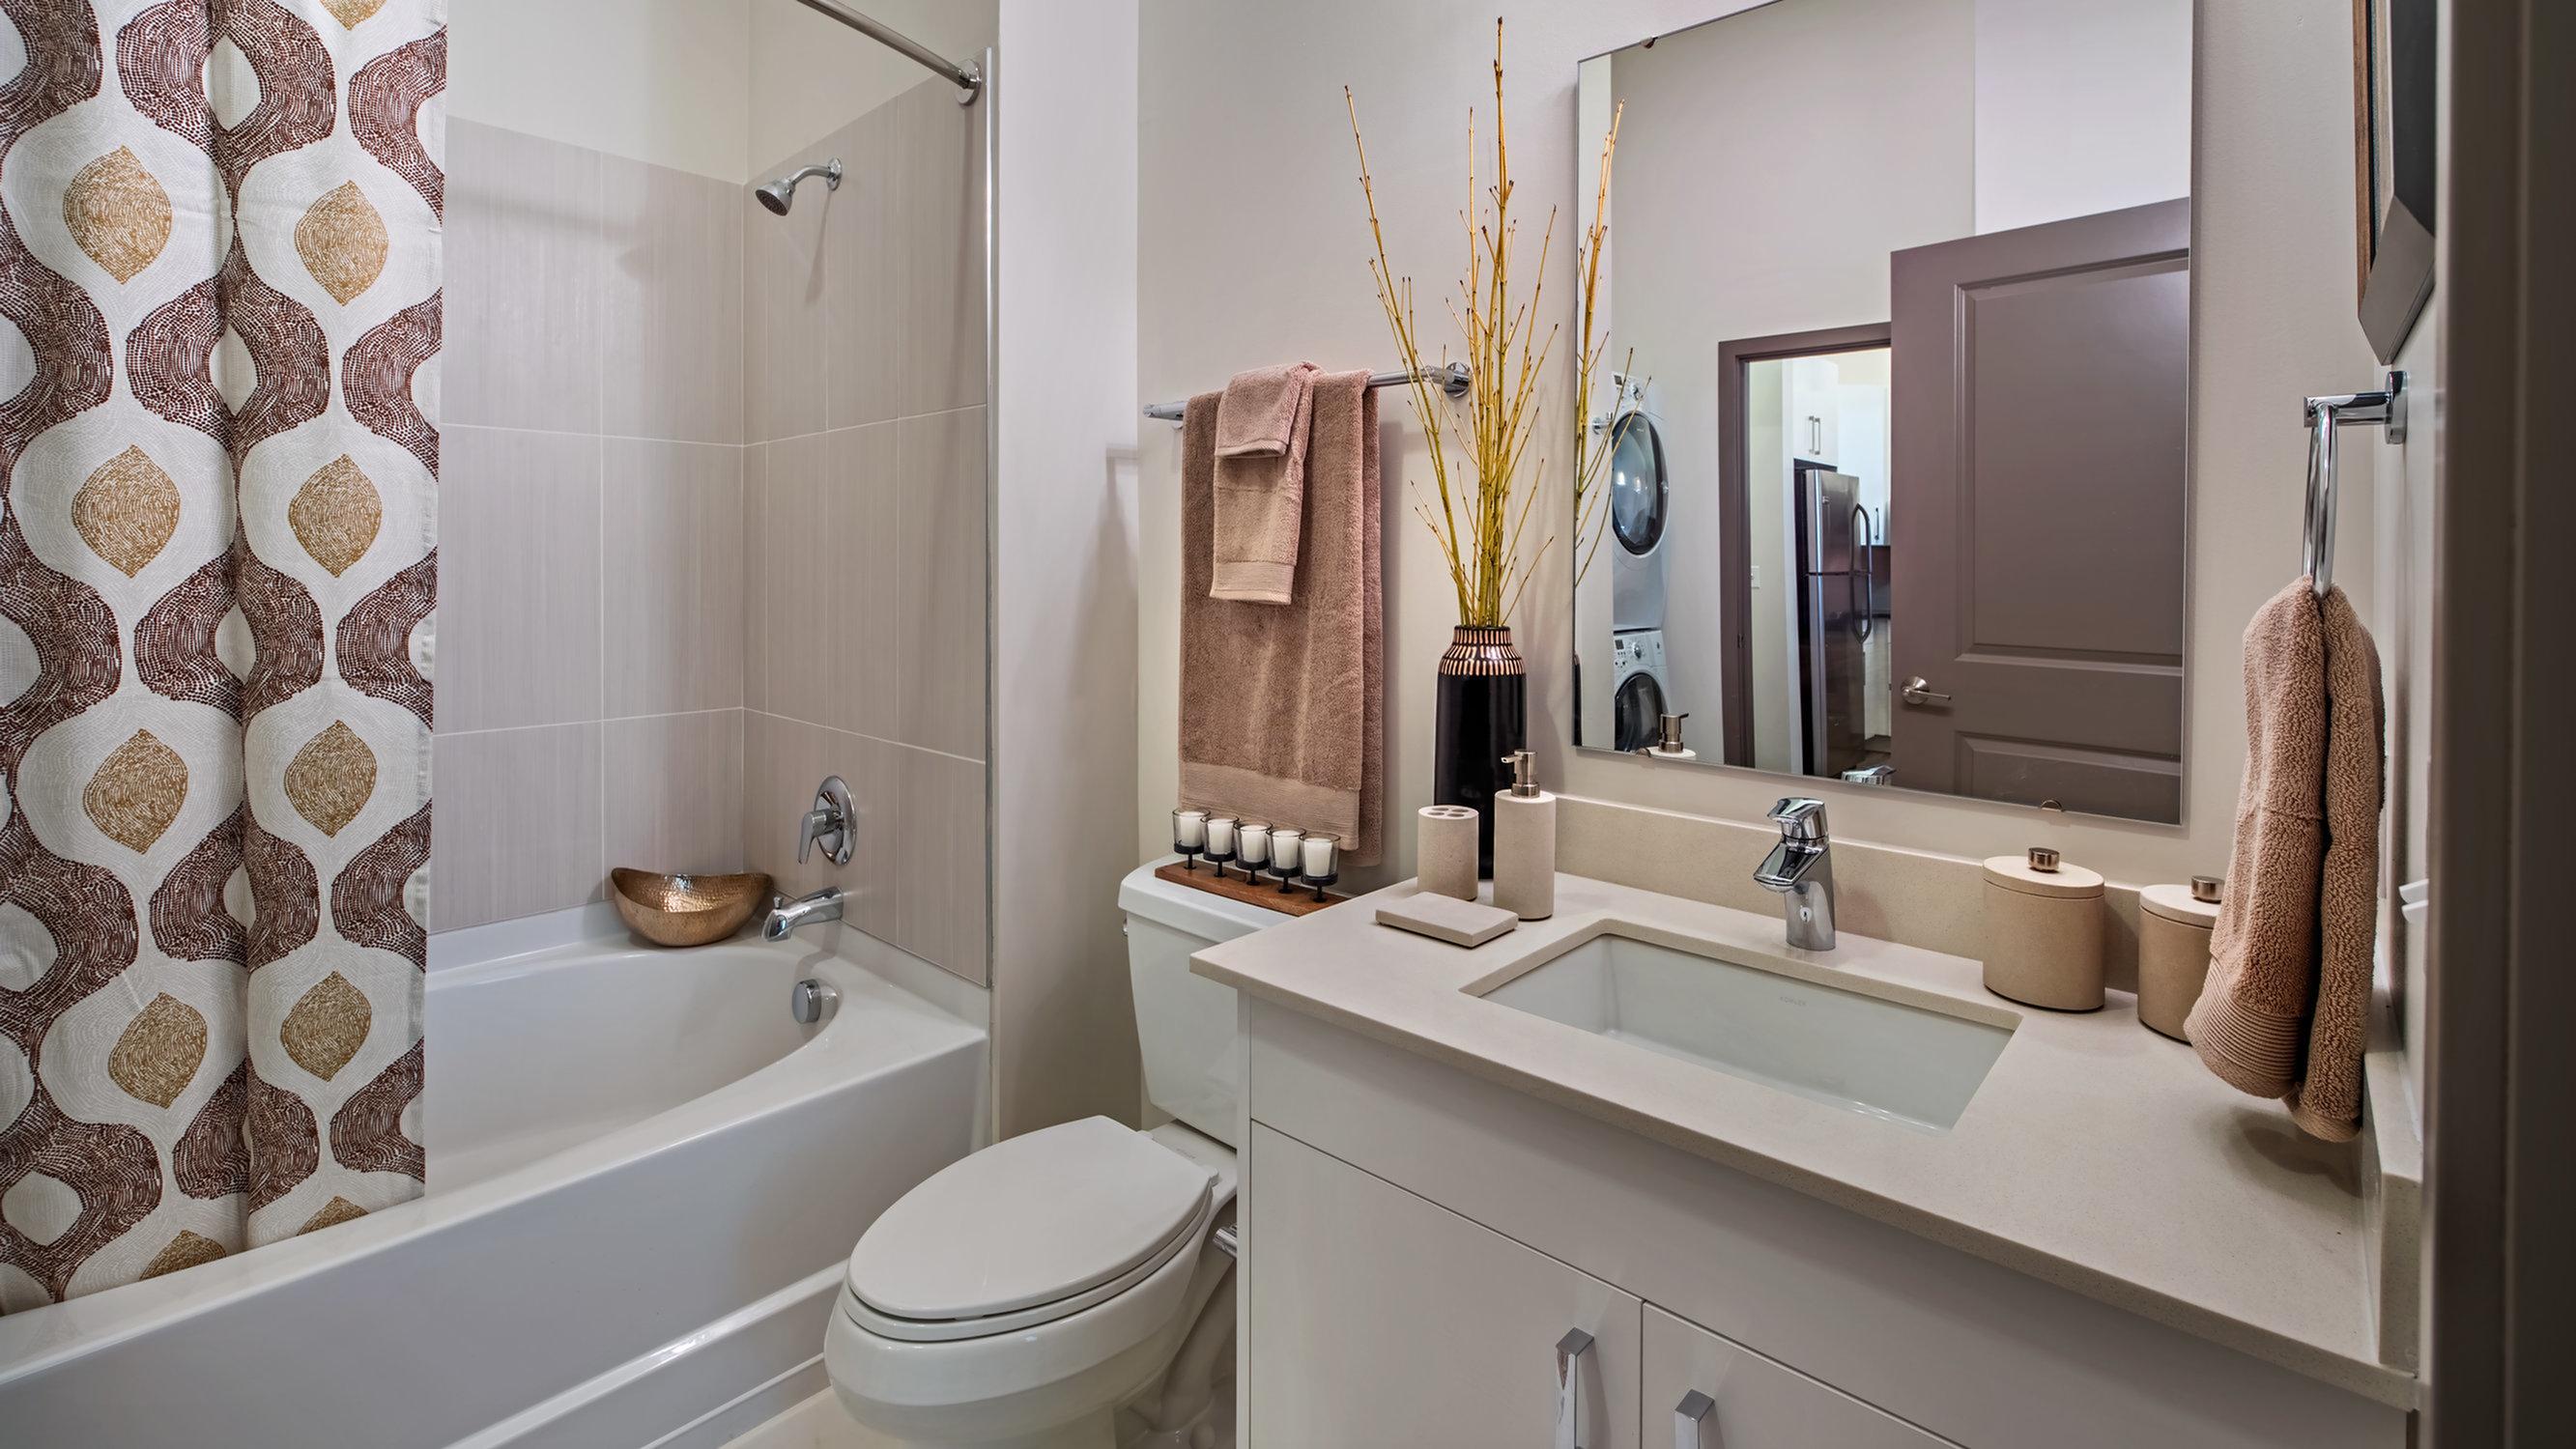 Image of Water-saving Bath Fixtures for Eastside Bond